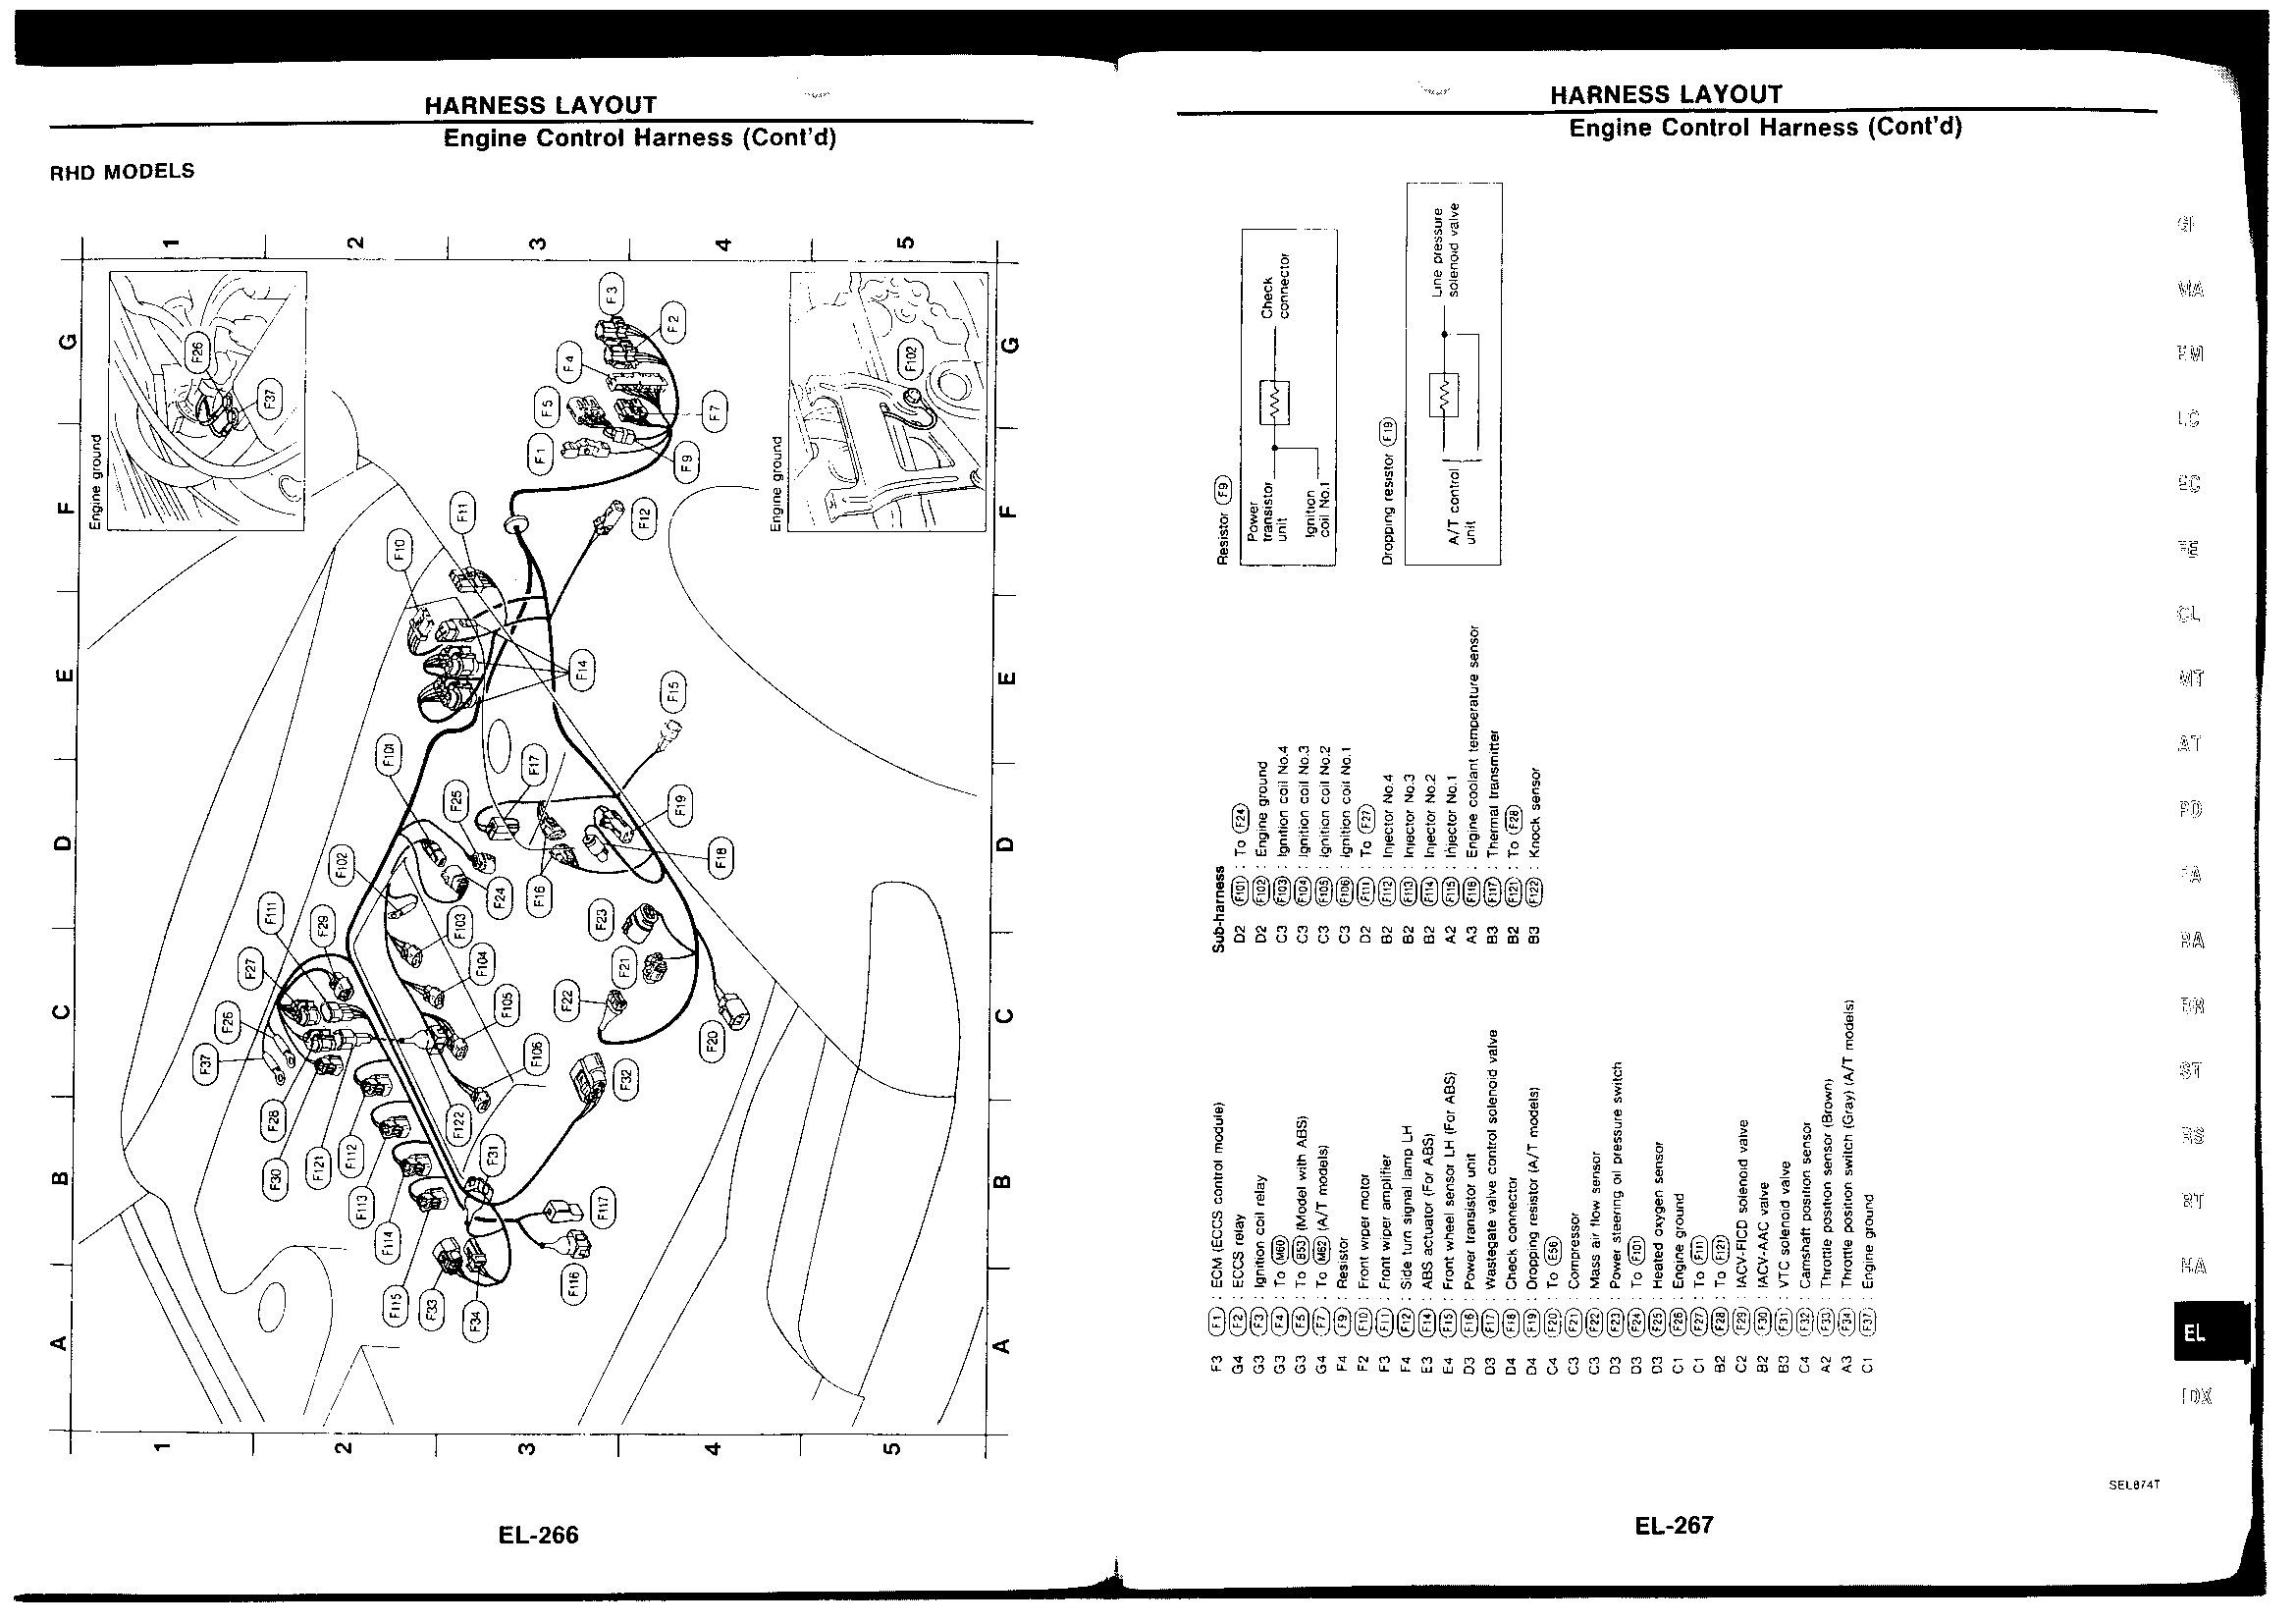 camstat wiring diagram for oil gandul 45 77 79 119 s14 zenki sr20det english text page 802 w  [ 2339 x 1653 Pixel ]